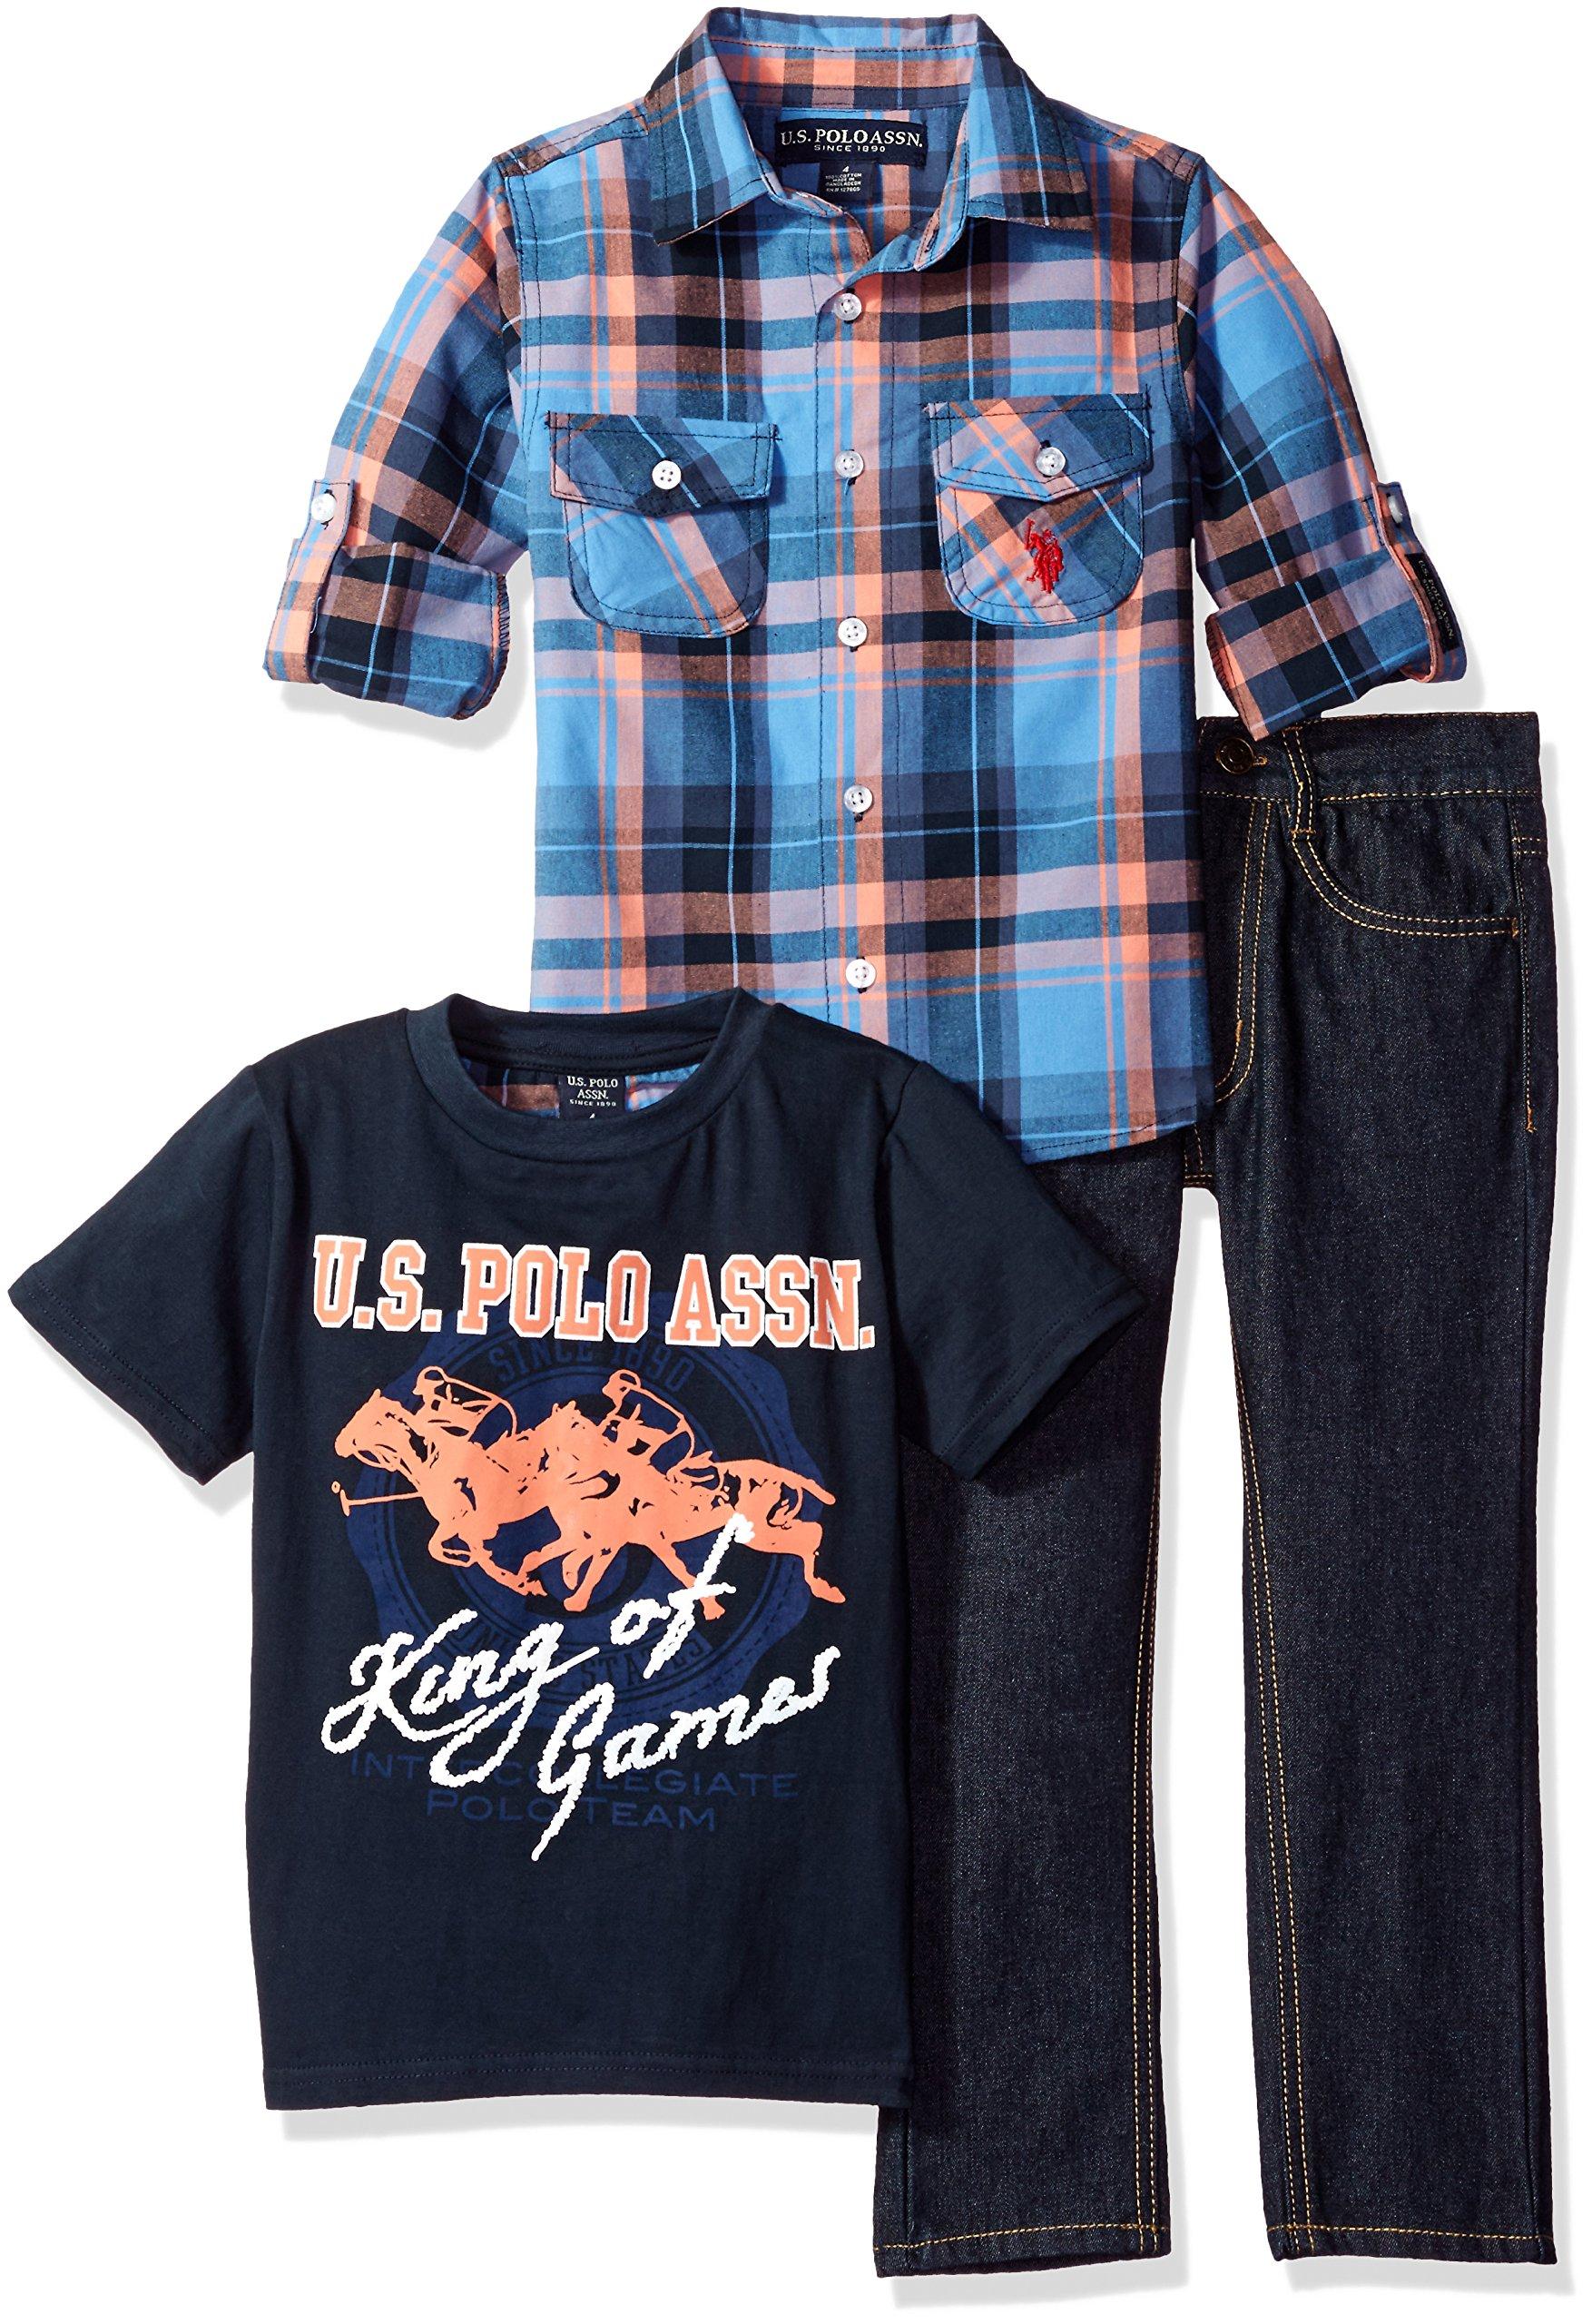 U.S. Polo Assn. Boys' Toddler Boys' 3 Piece Long Sleeve Fancy Sport Shirt, T-Shirt Or Creeper, and Denim Jean Set, 0228 Blue/Pink Plaid, 3T